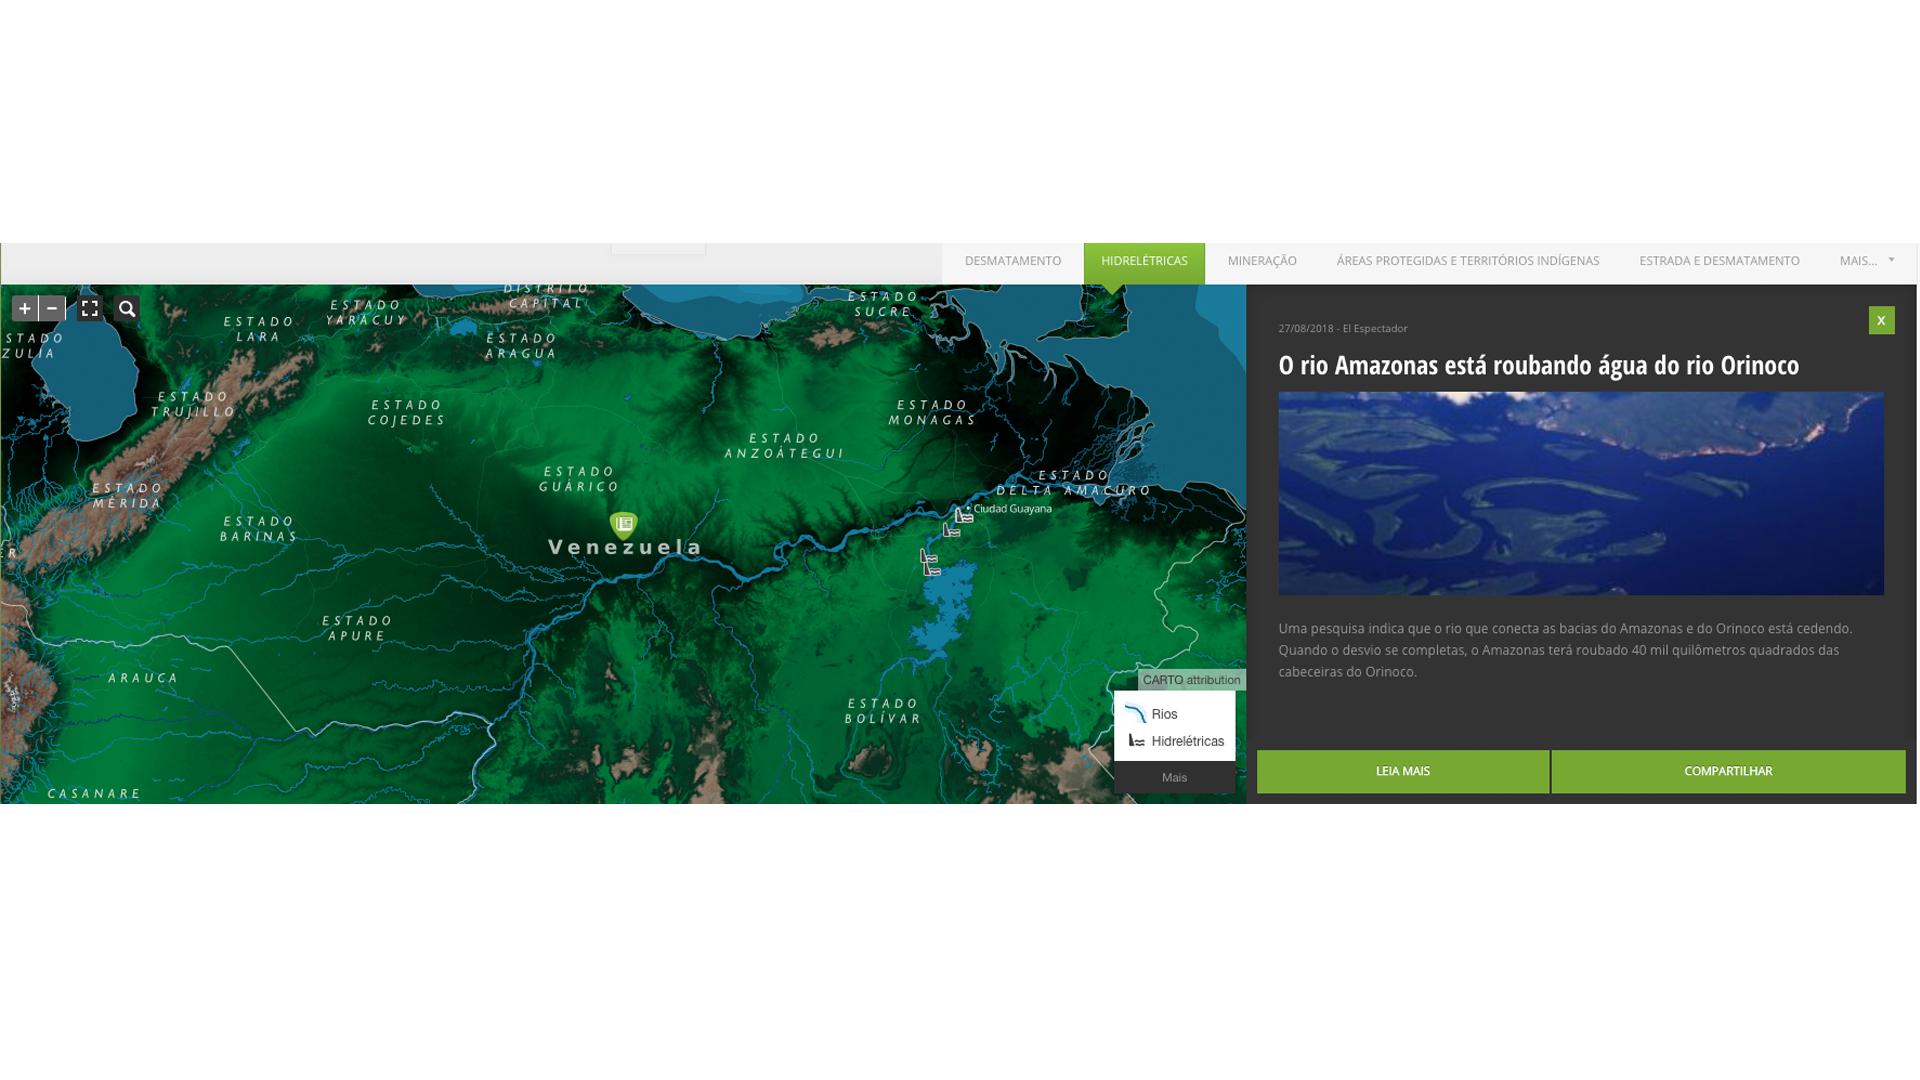 InfoAmz_Mapa_Hidreletricas_1920x1080